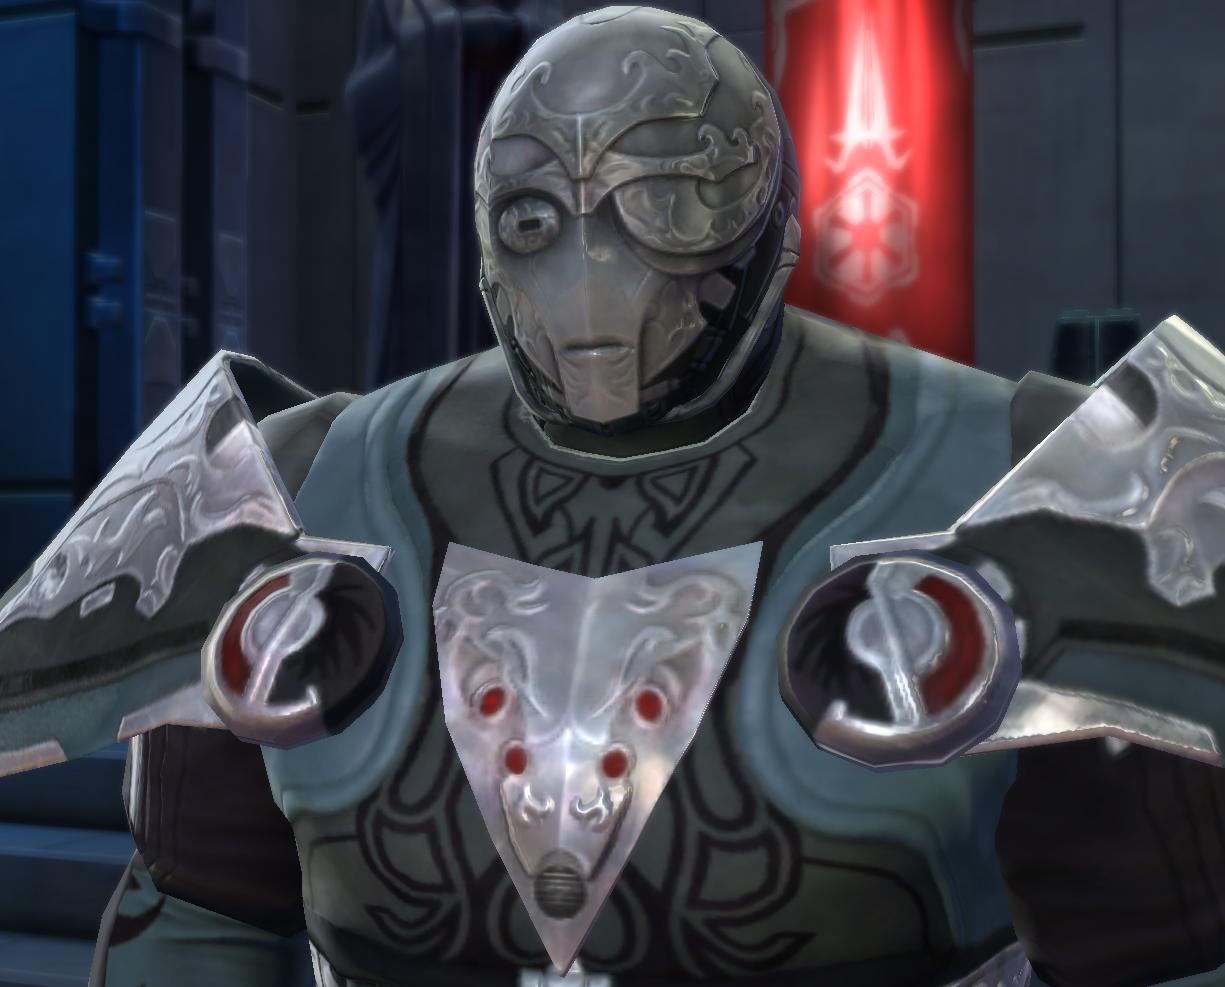 swtor how to get revan reborn armor set